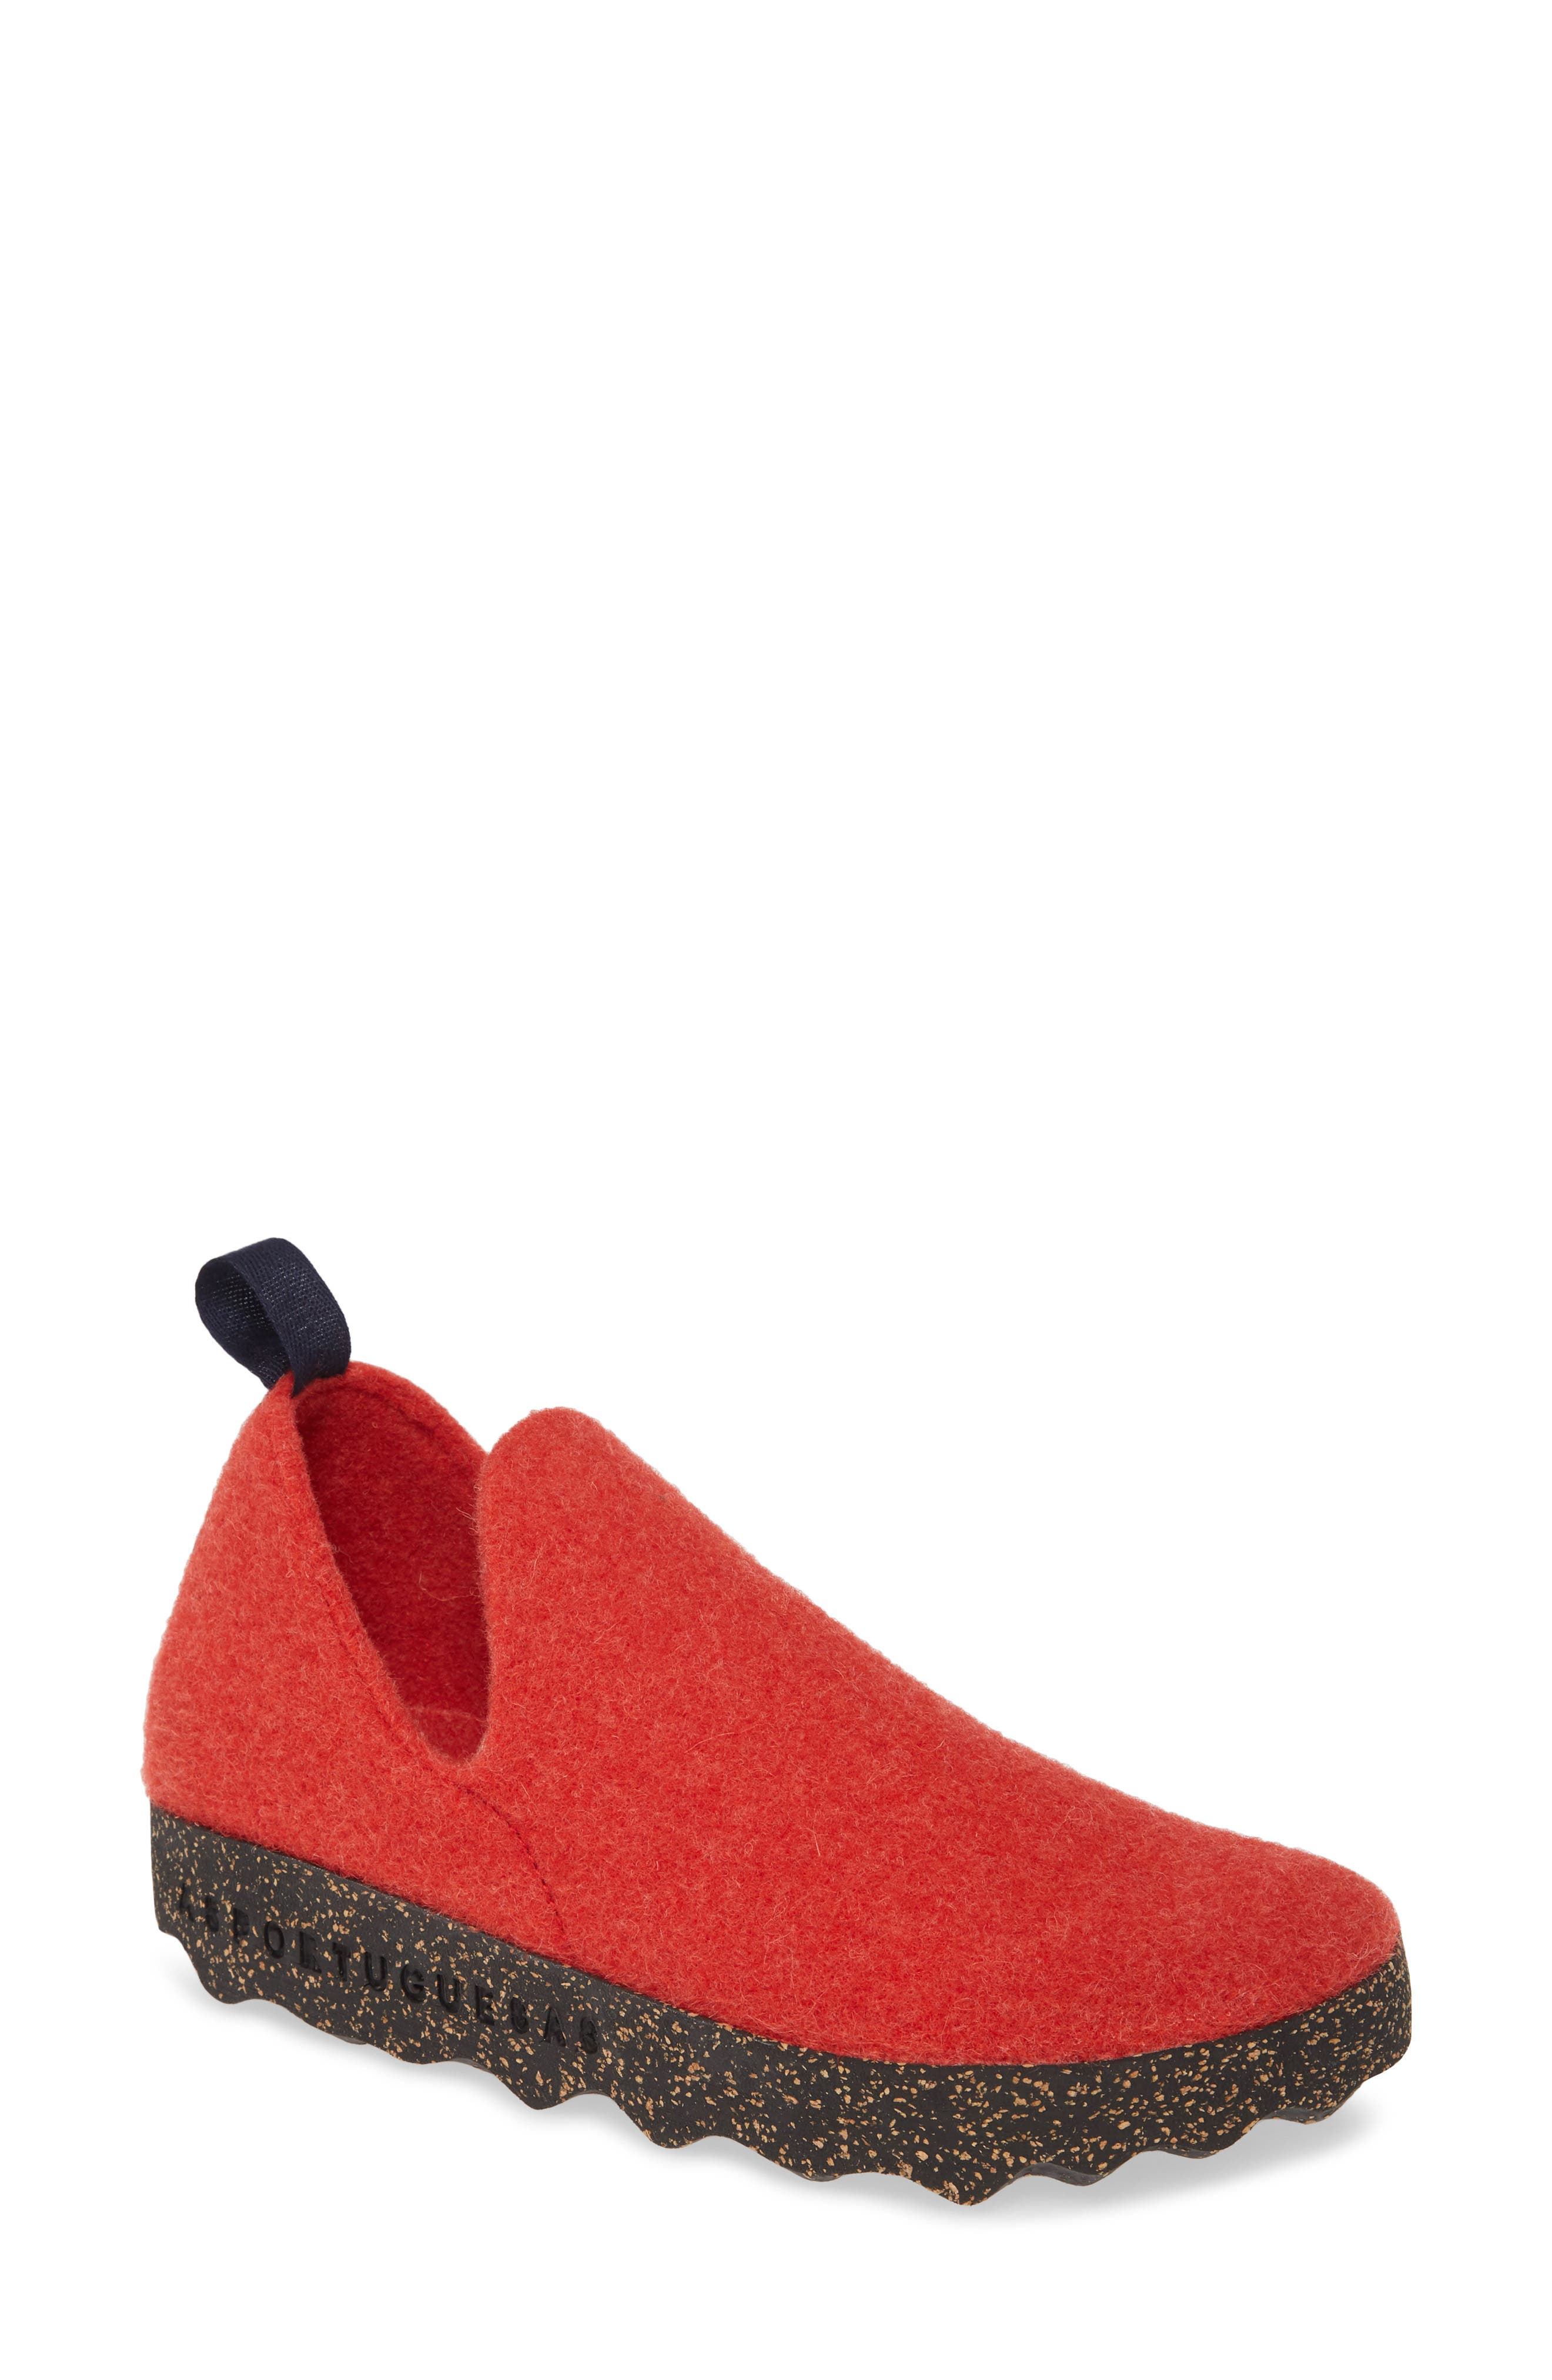 Asportuguesas By Fly London City Sneaker - Red